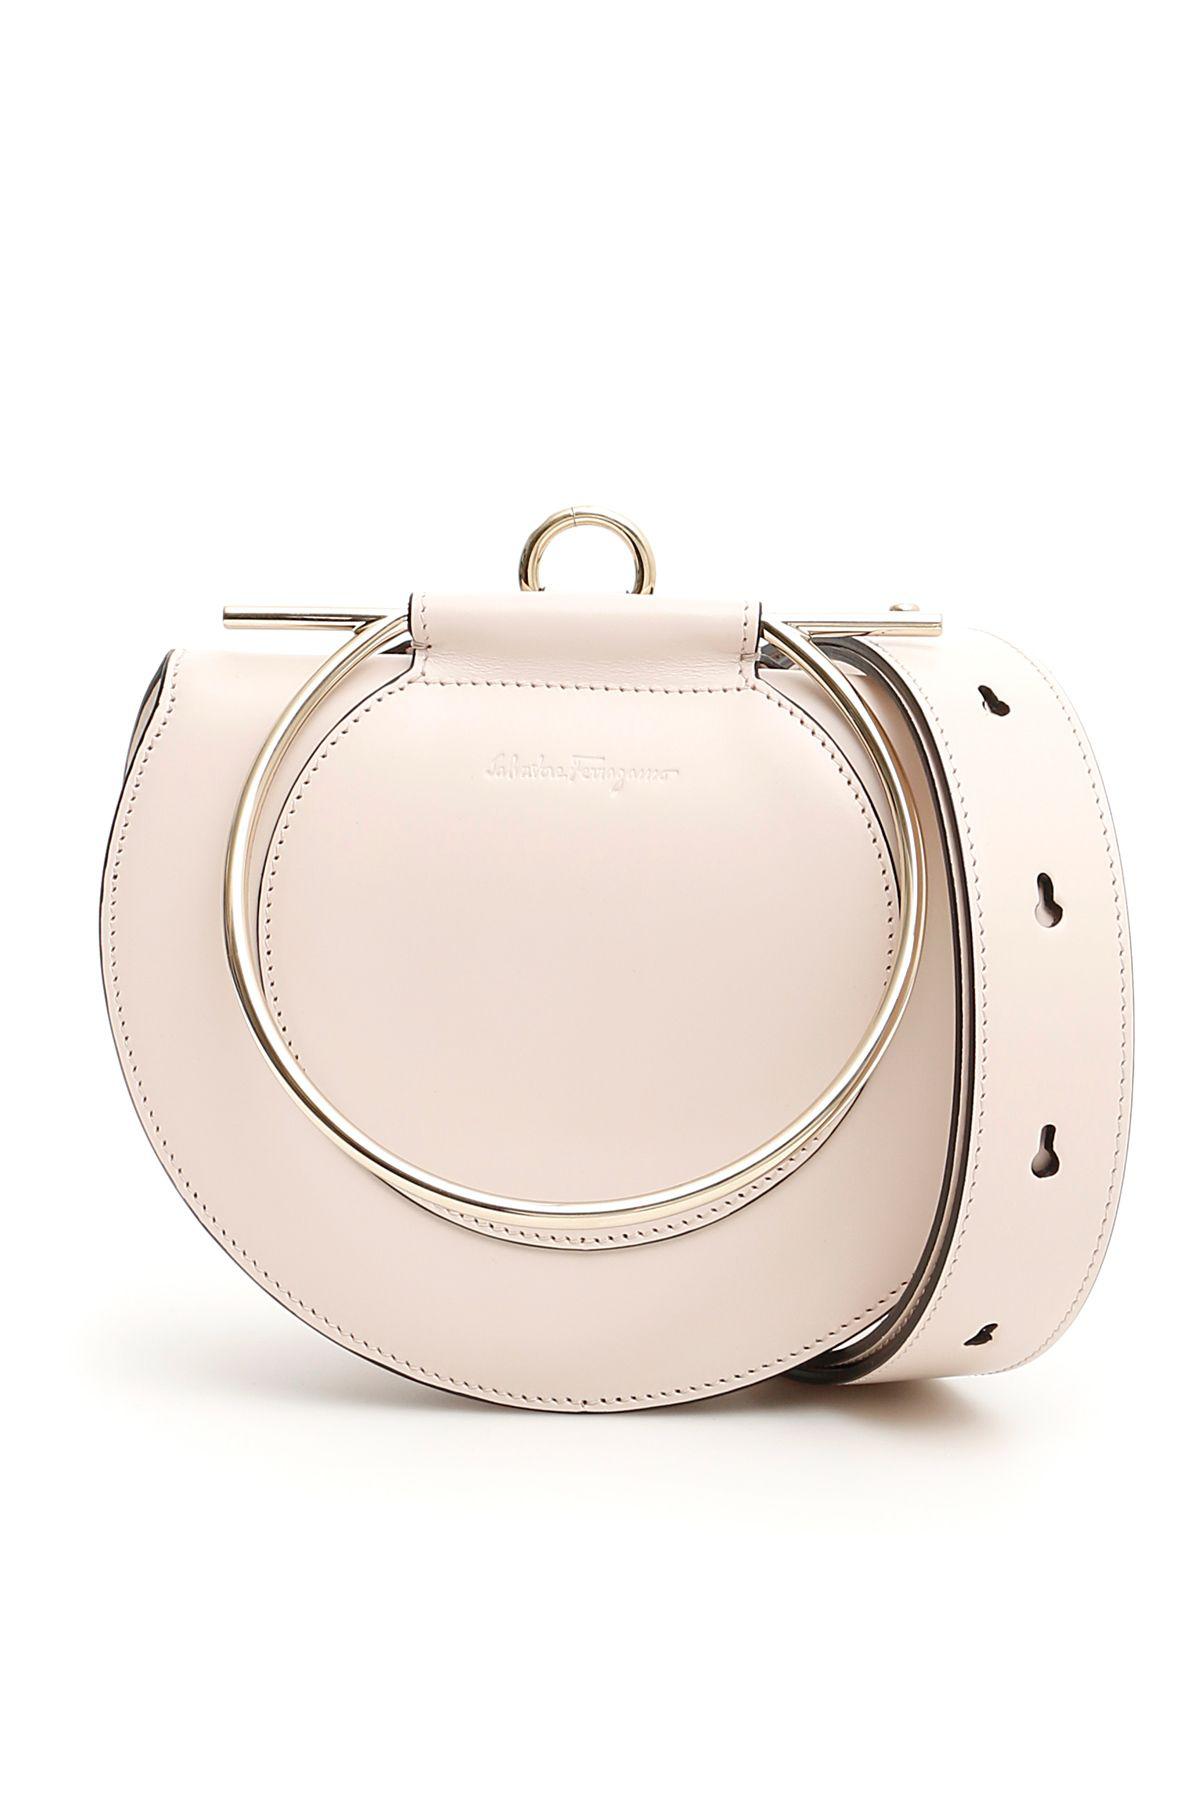 Salvatore Ferragamo Daphne Gancino Pale Blush Shoulder Bag In White ... 3aae157546fe3